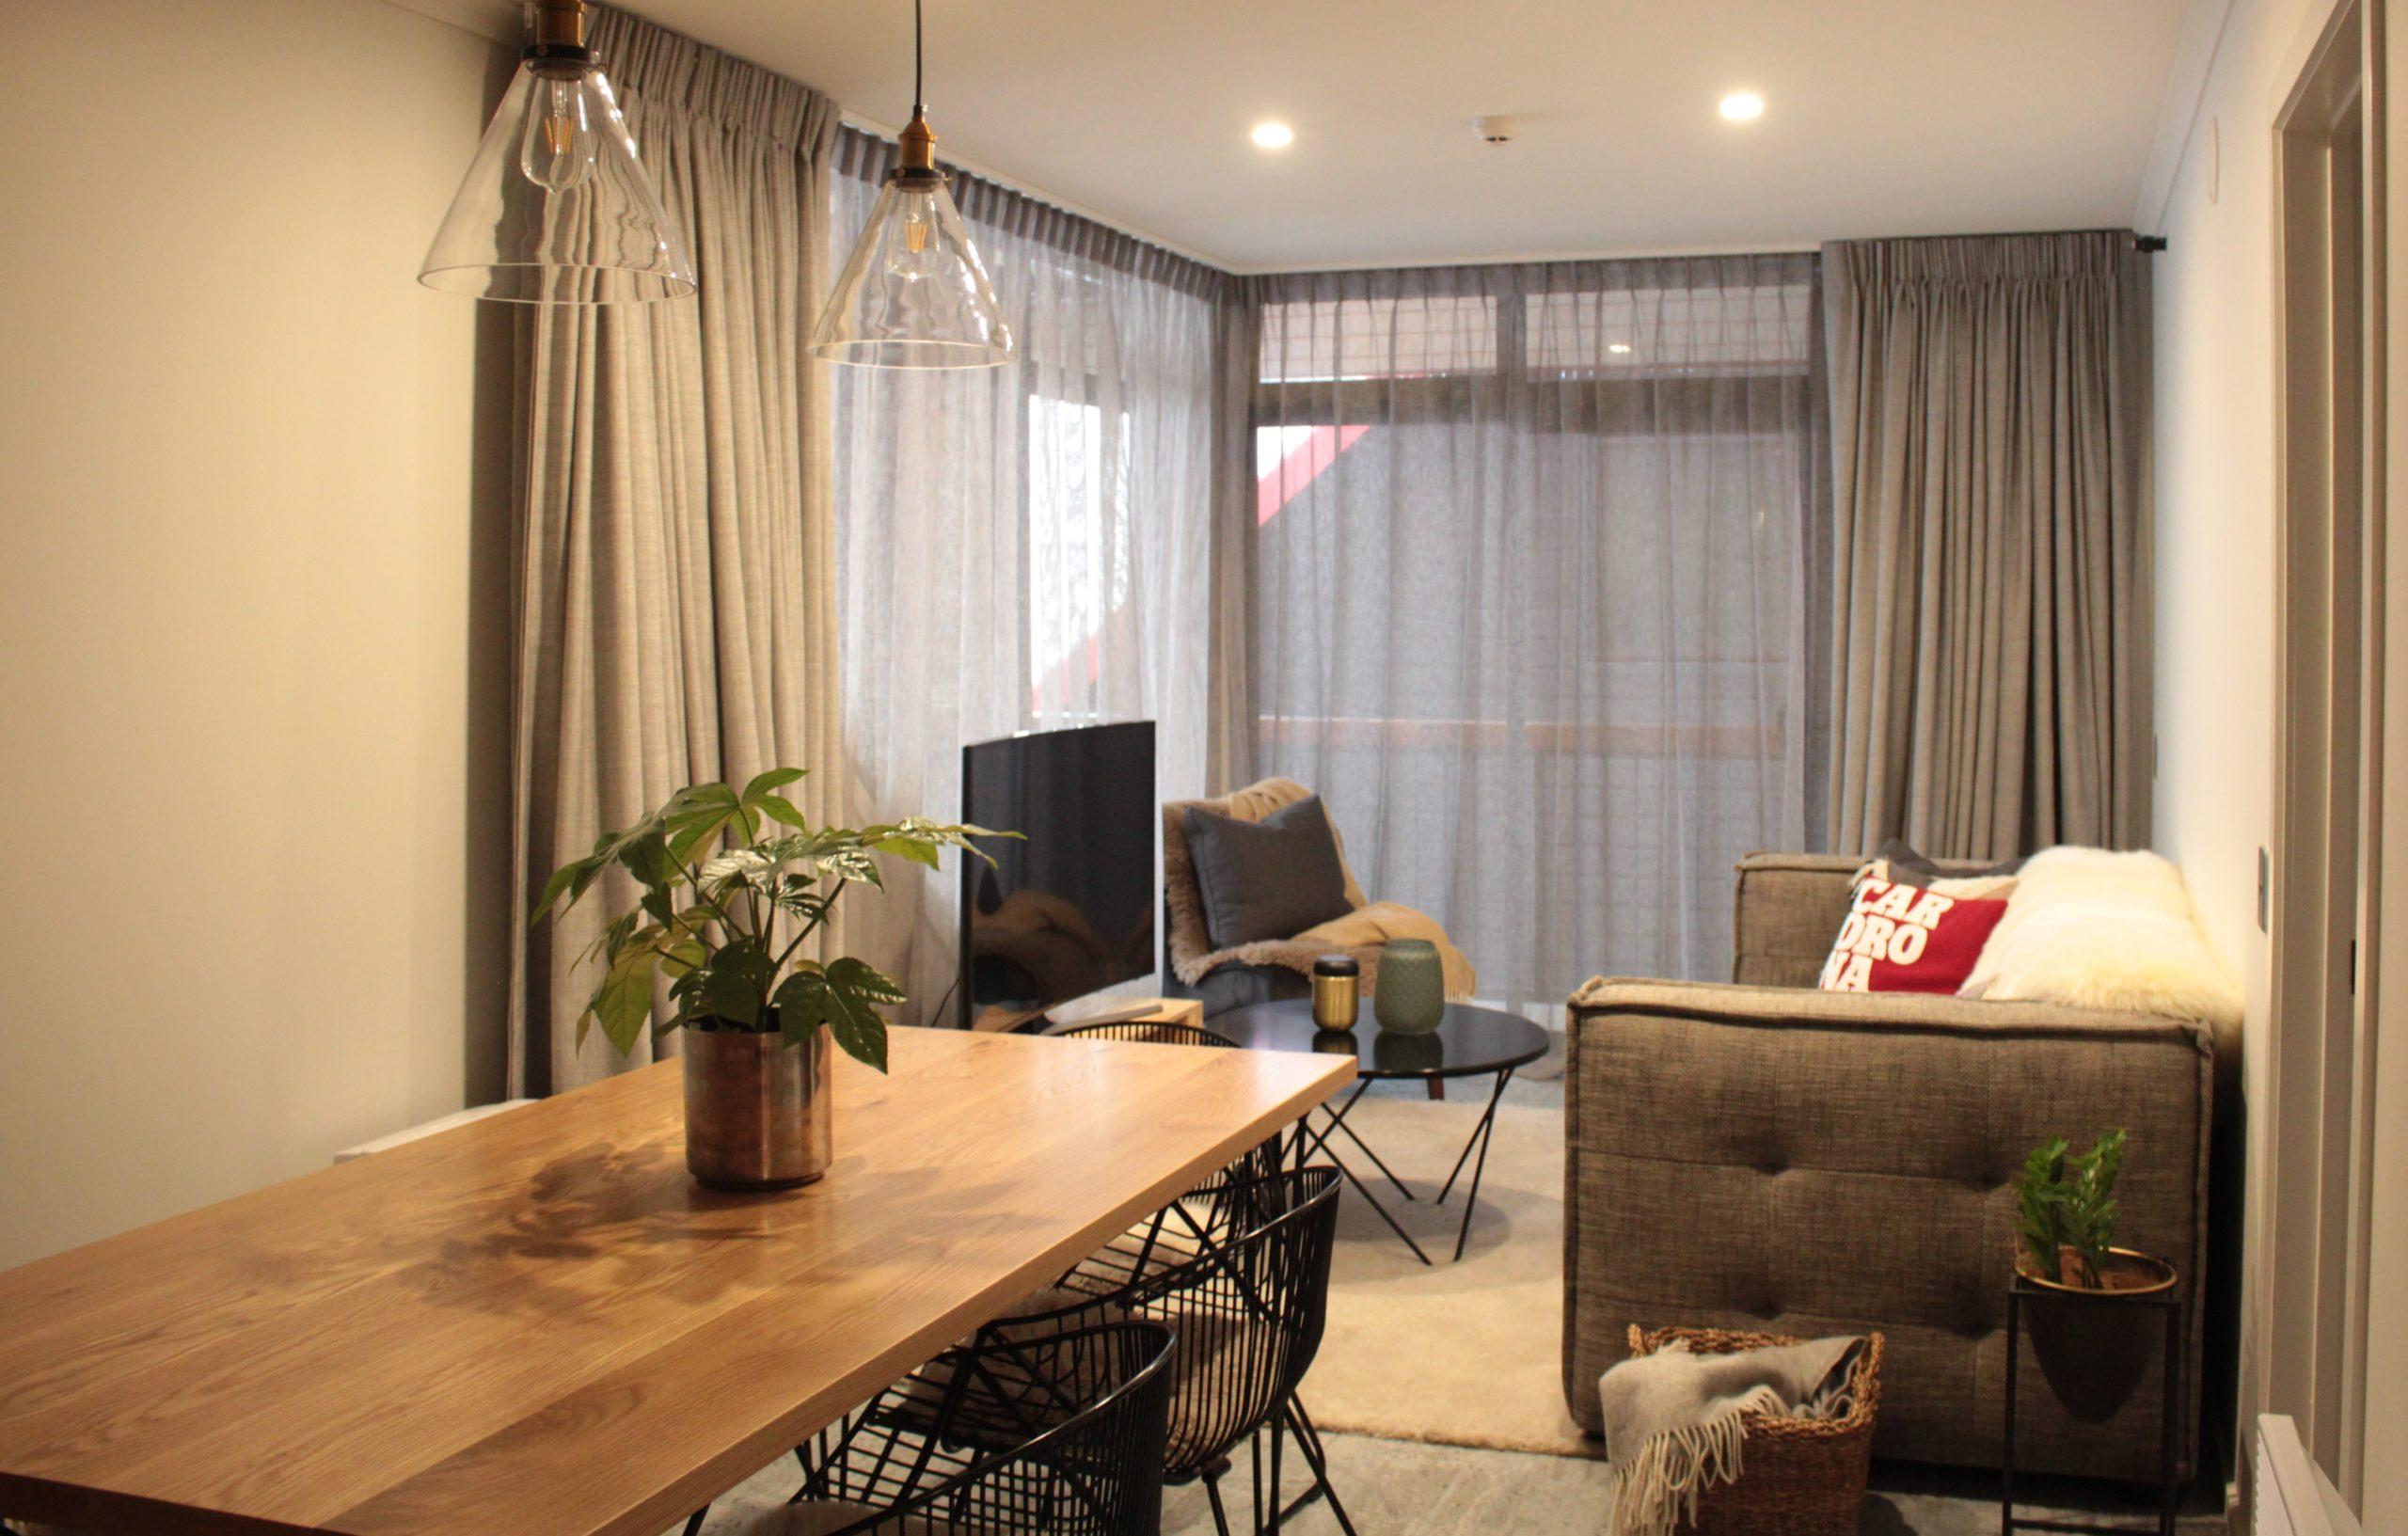 Cardrona Alpine Resort - 2 Bedroom Apartment